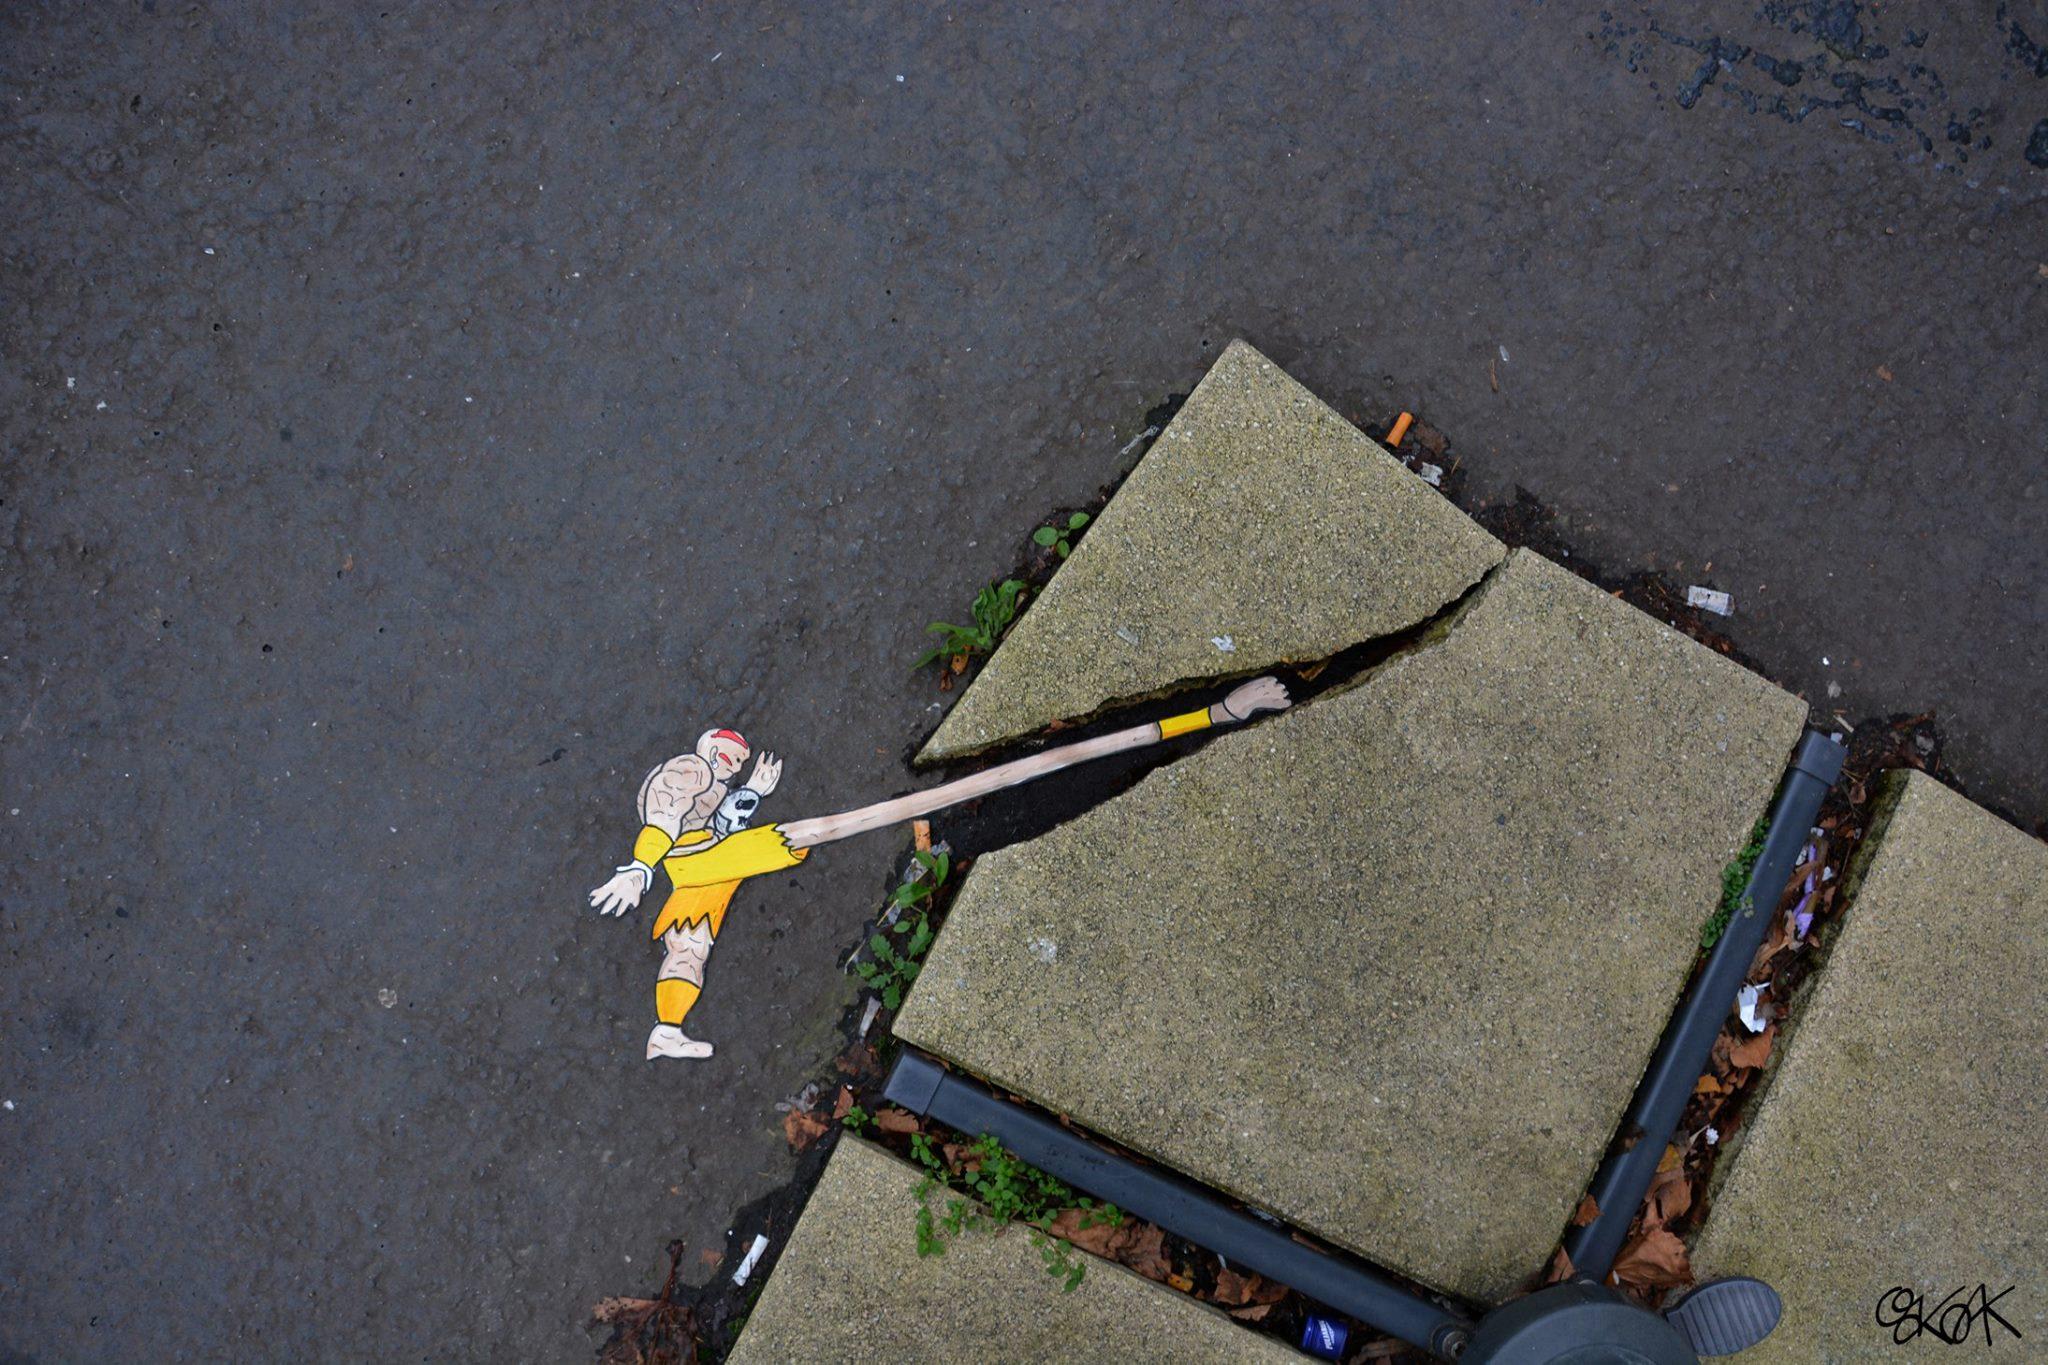 cool-street-art-from-paris-oak-oak-part2-13